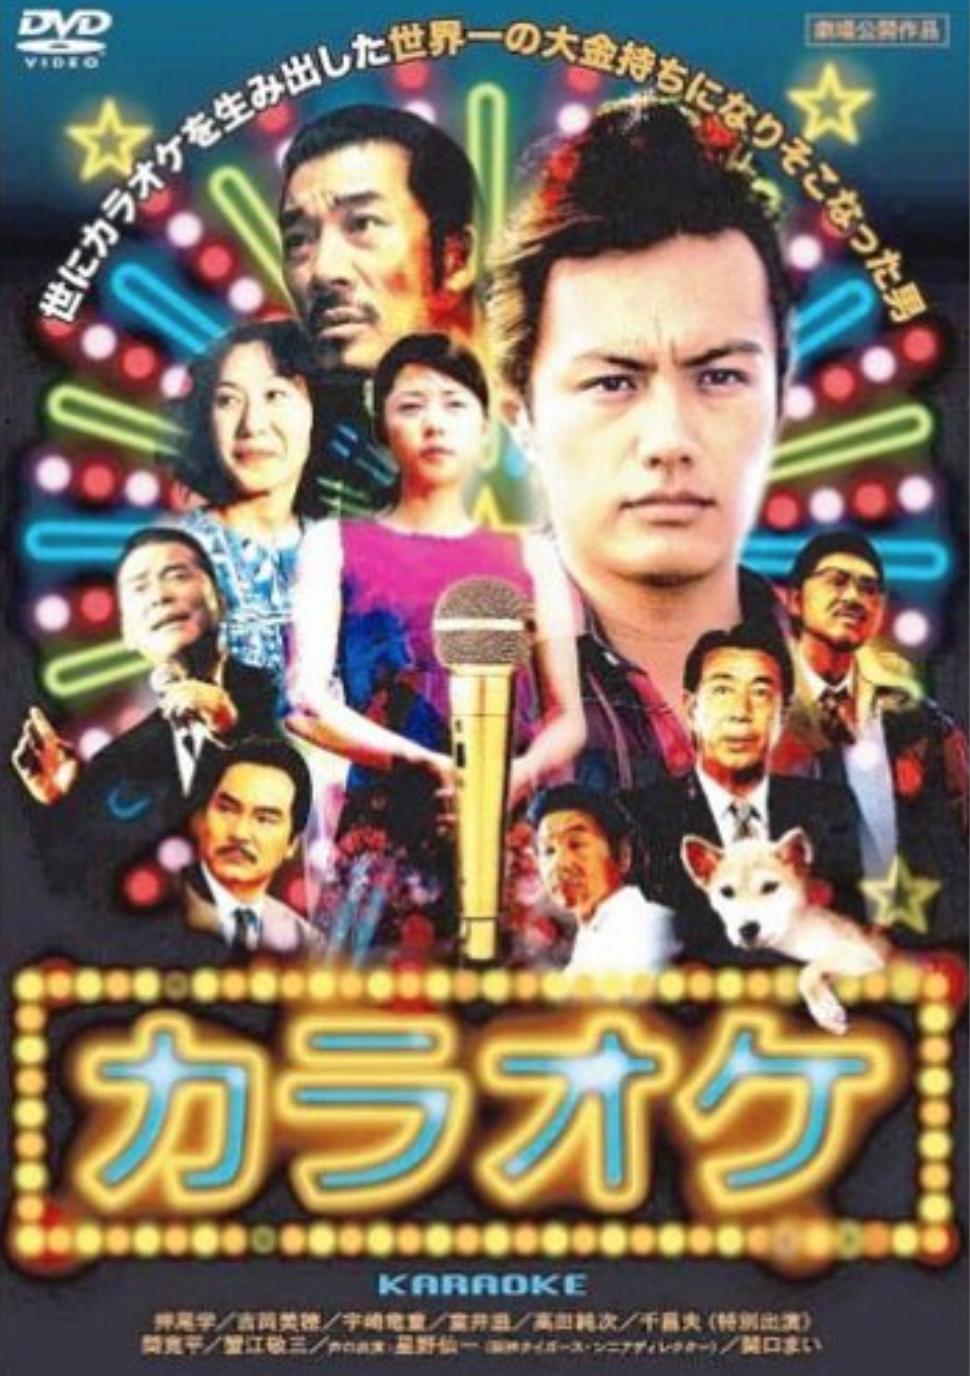 """Karaoke Man"": An Ode For the Expat In Japan Reeling From Ennui"